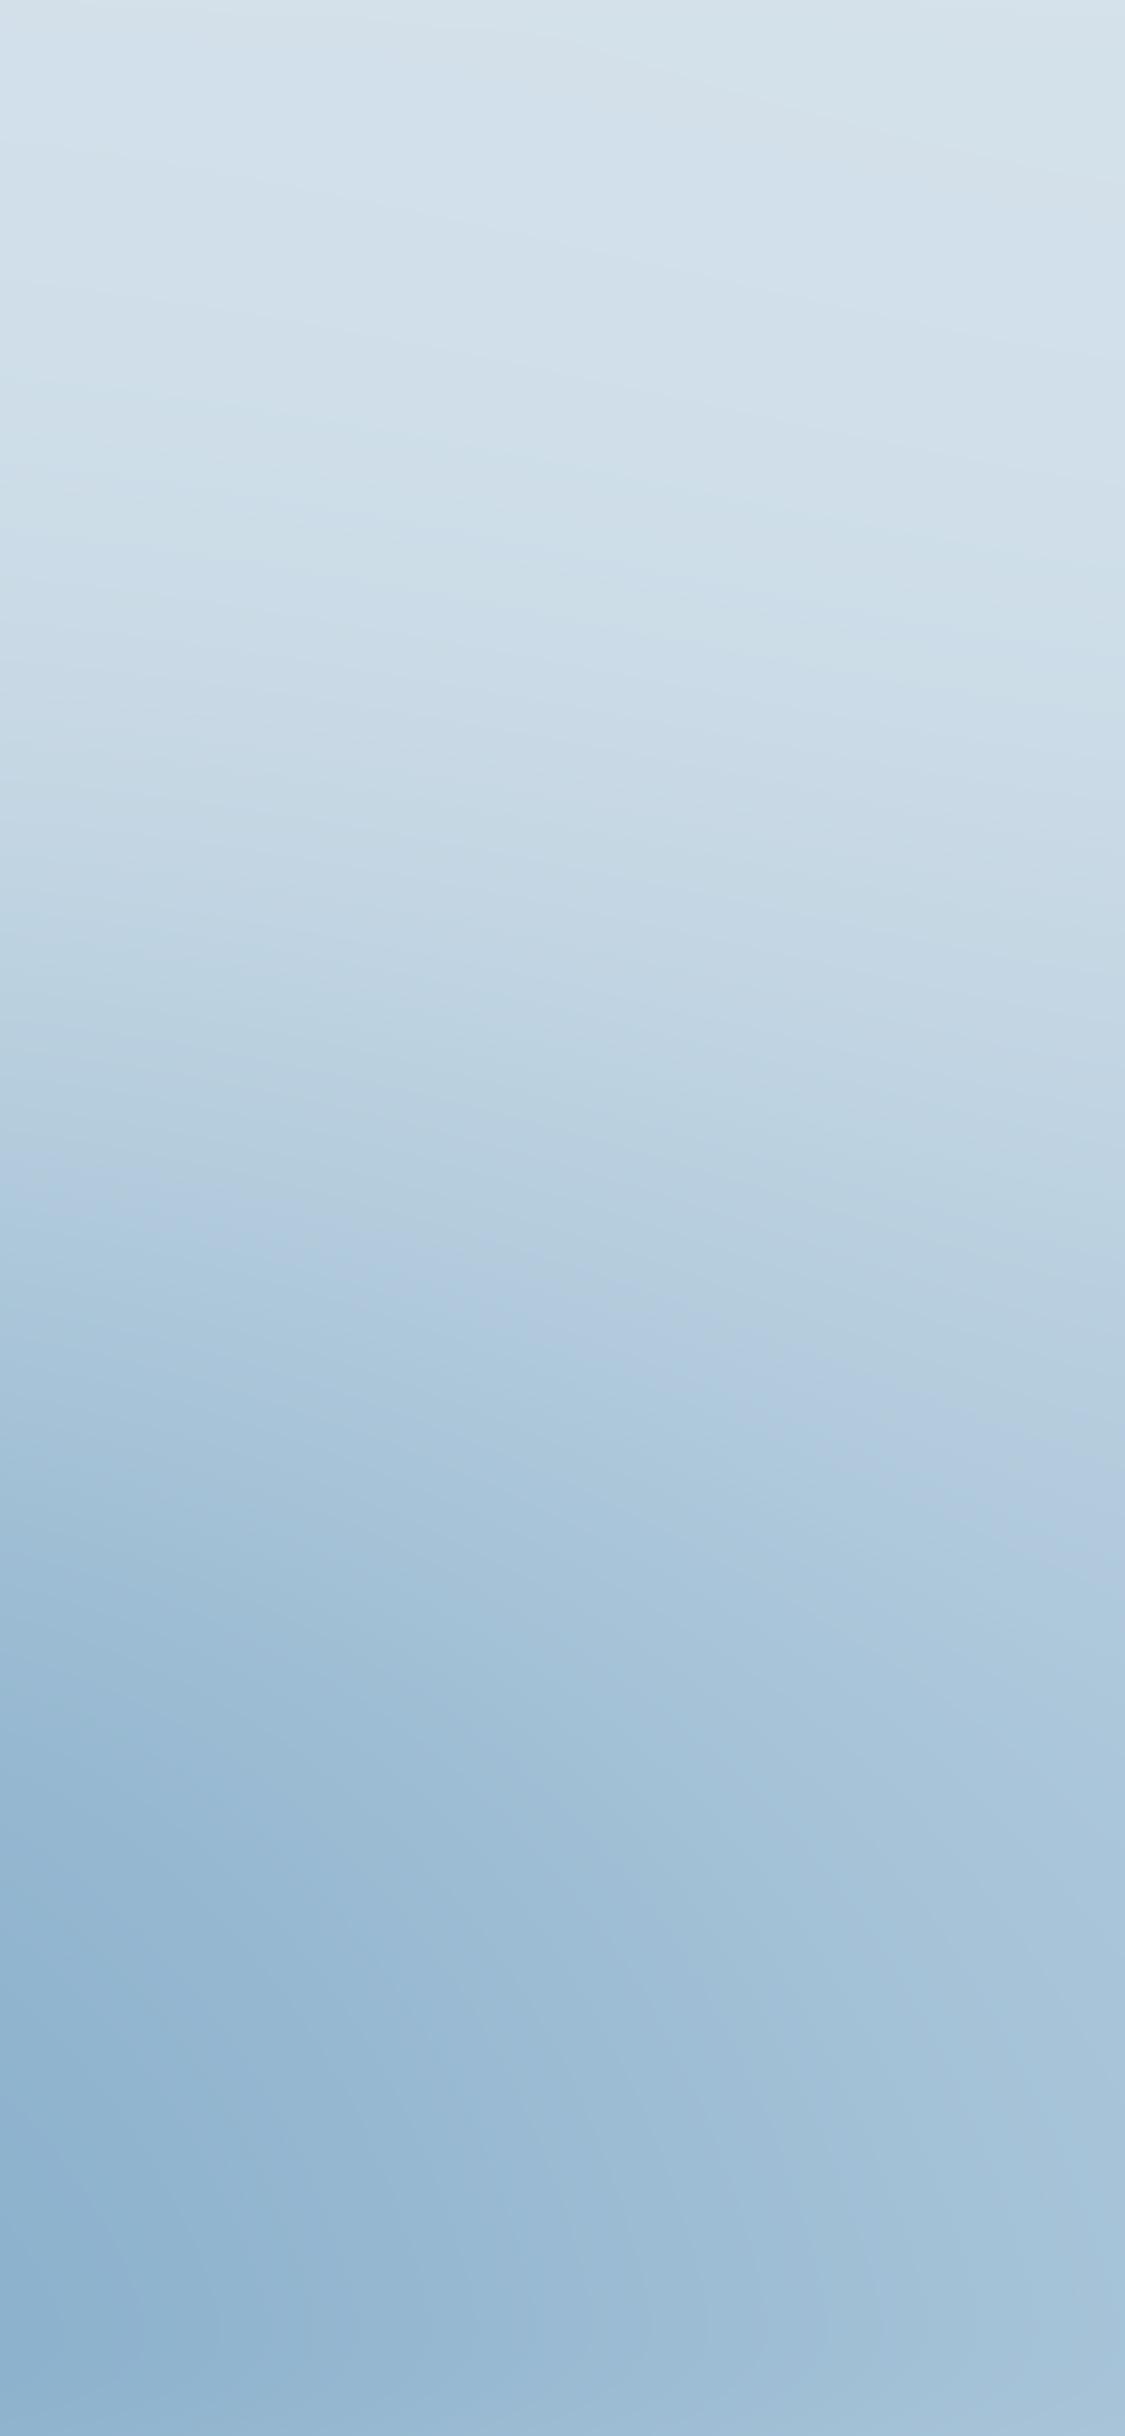 Sl98 Pastel Blue Blur Gradation Wallpaper